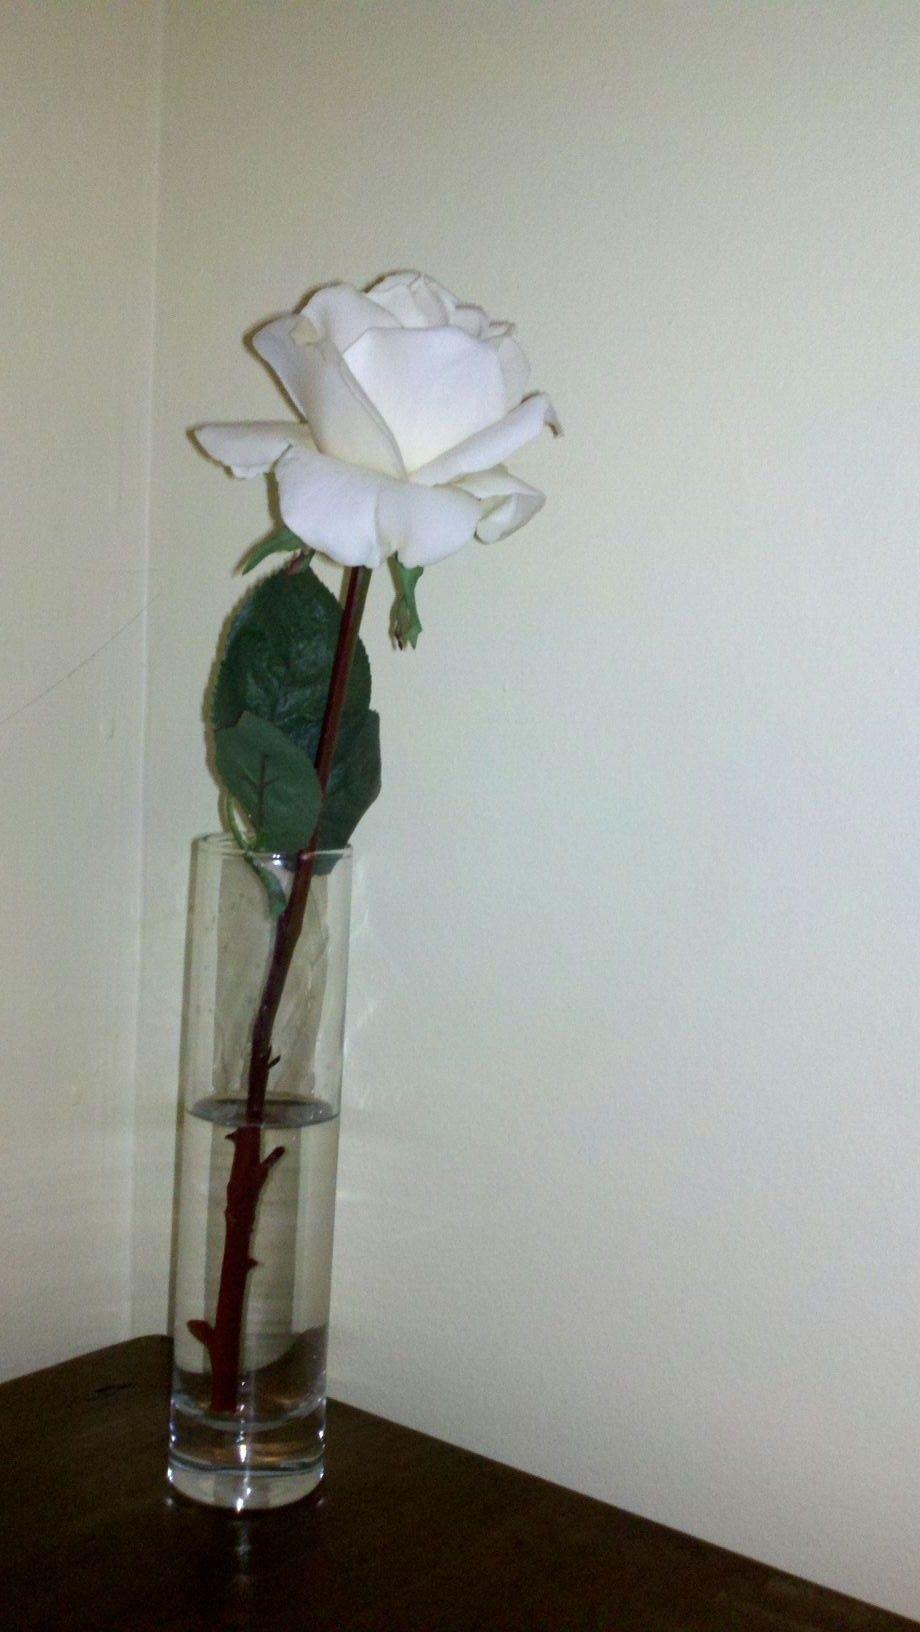 Hunger Games Craft: President Snow's Rose.